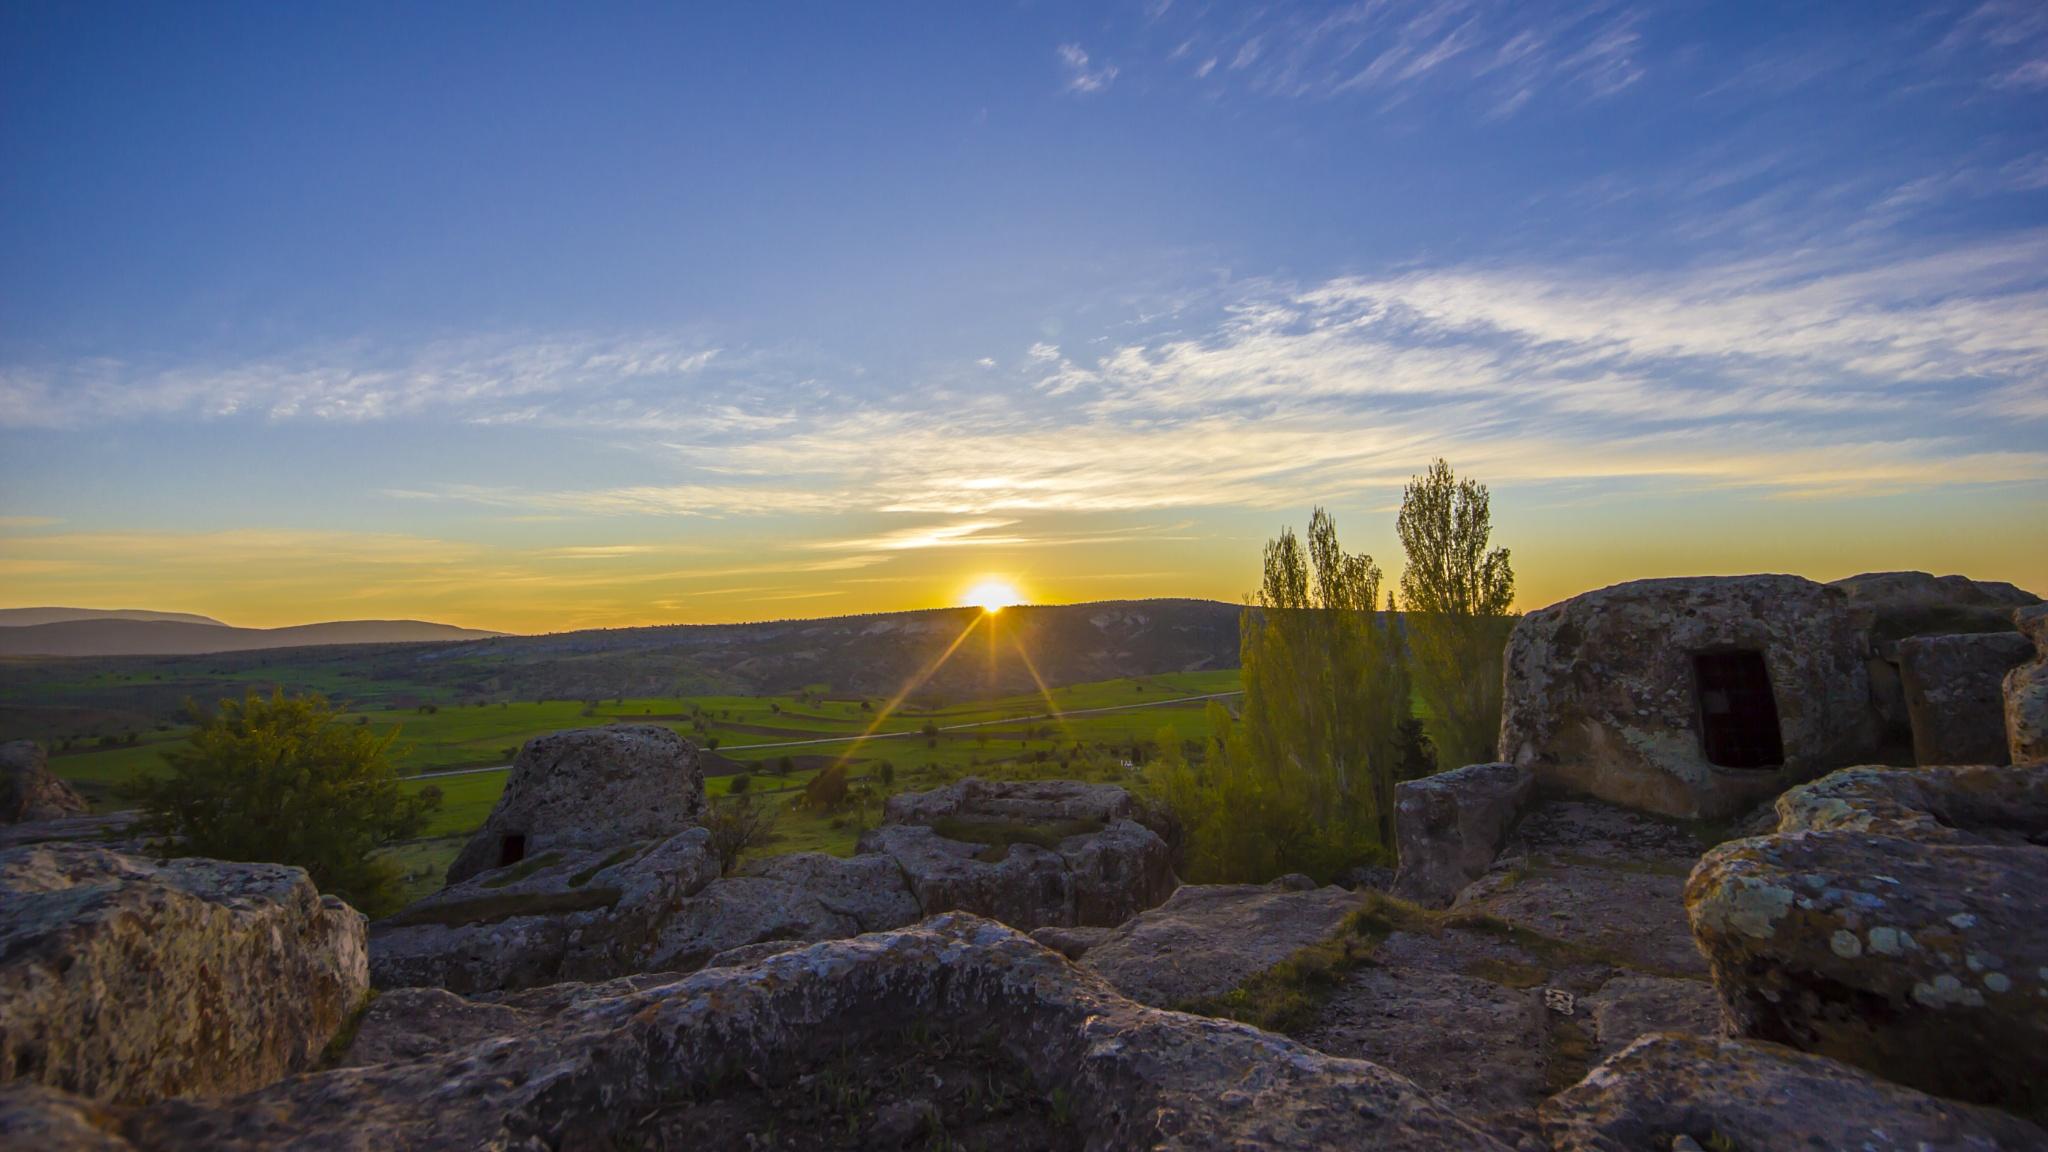 Kilistra Sunrise by Mehmet Can